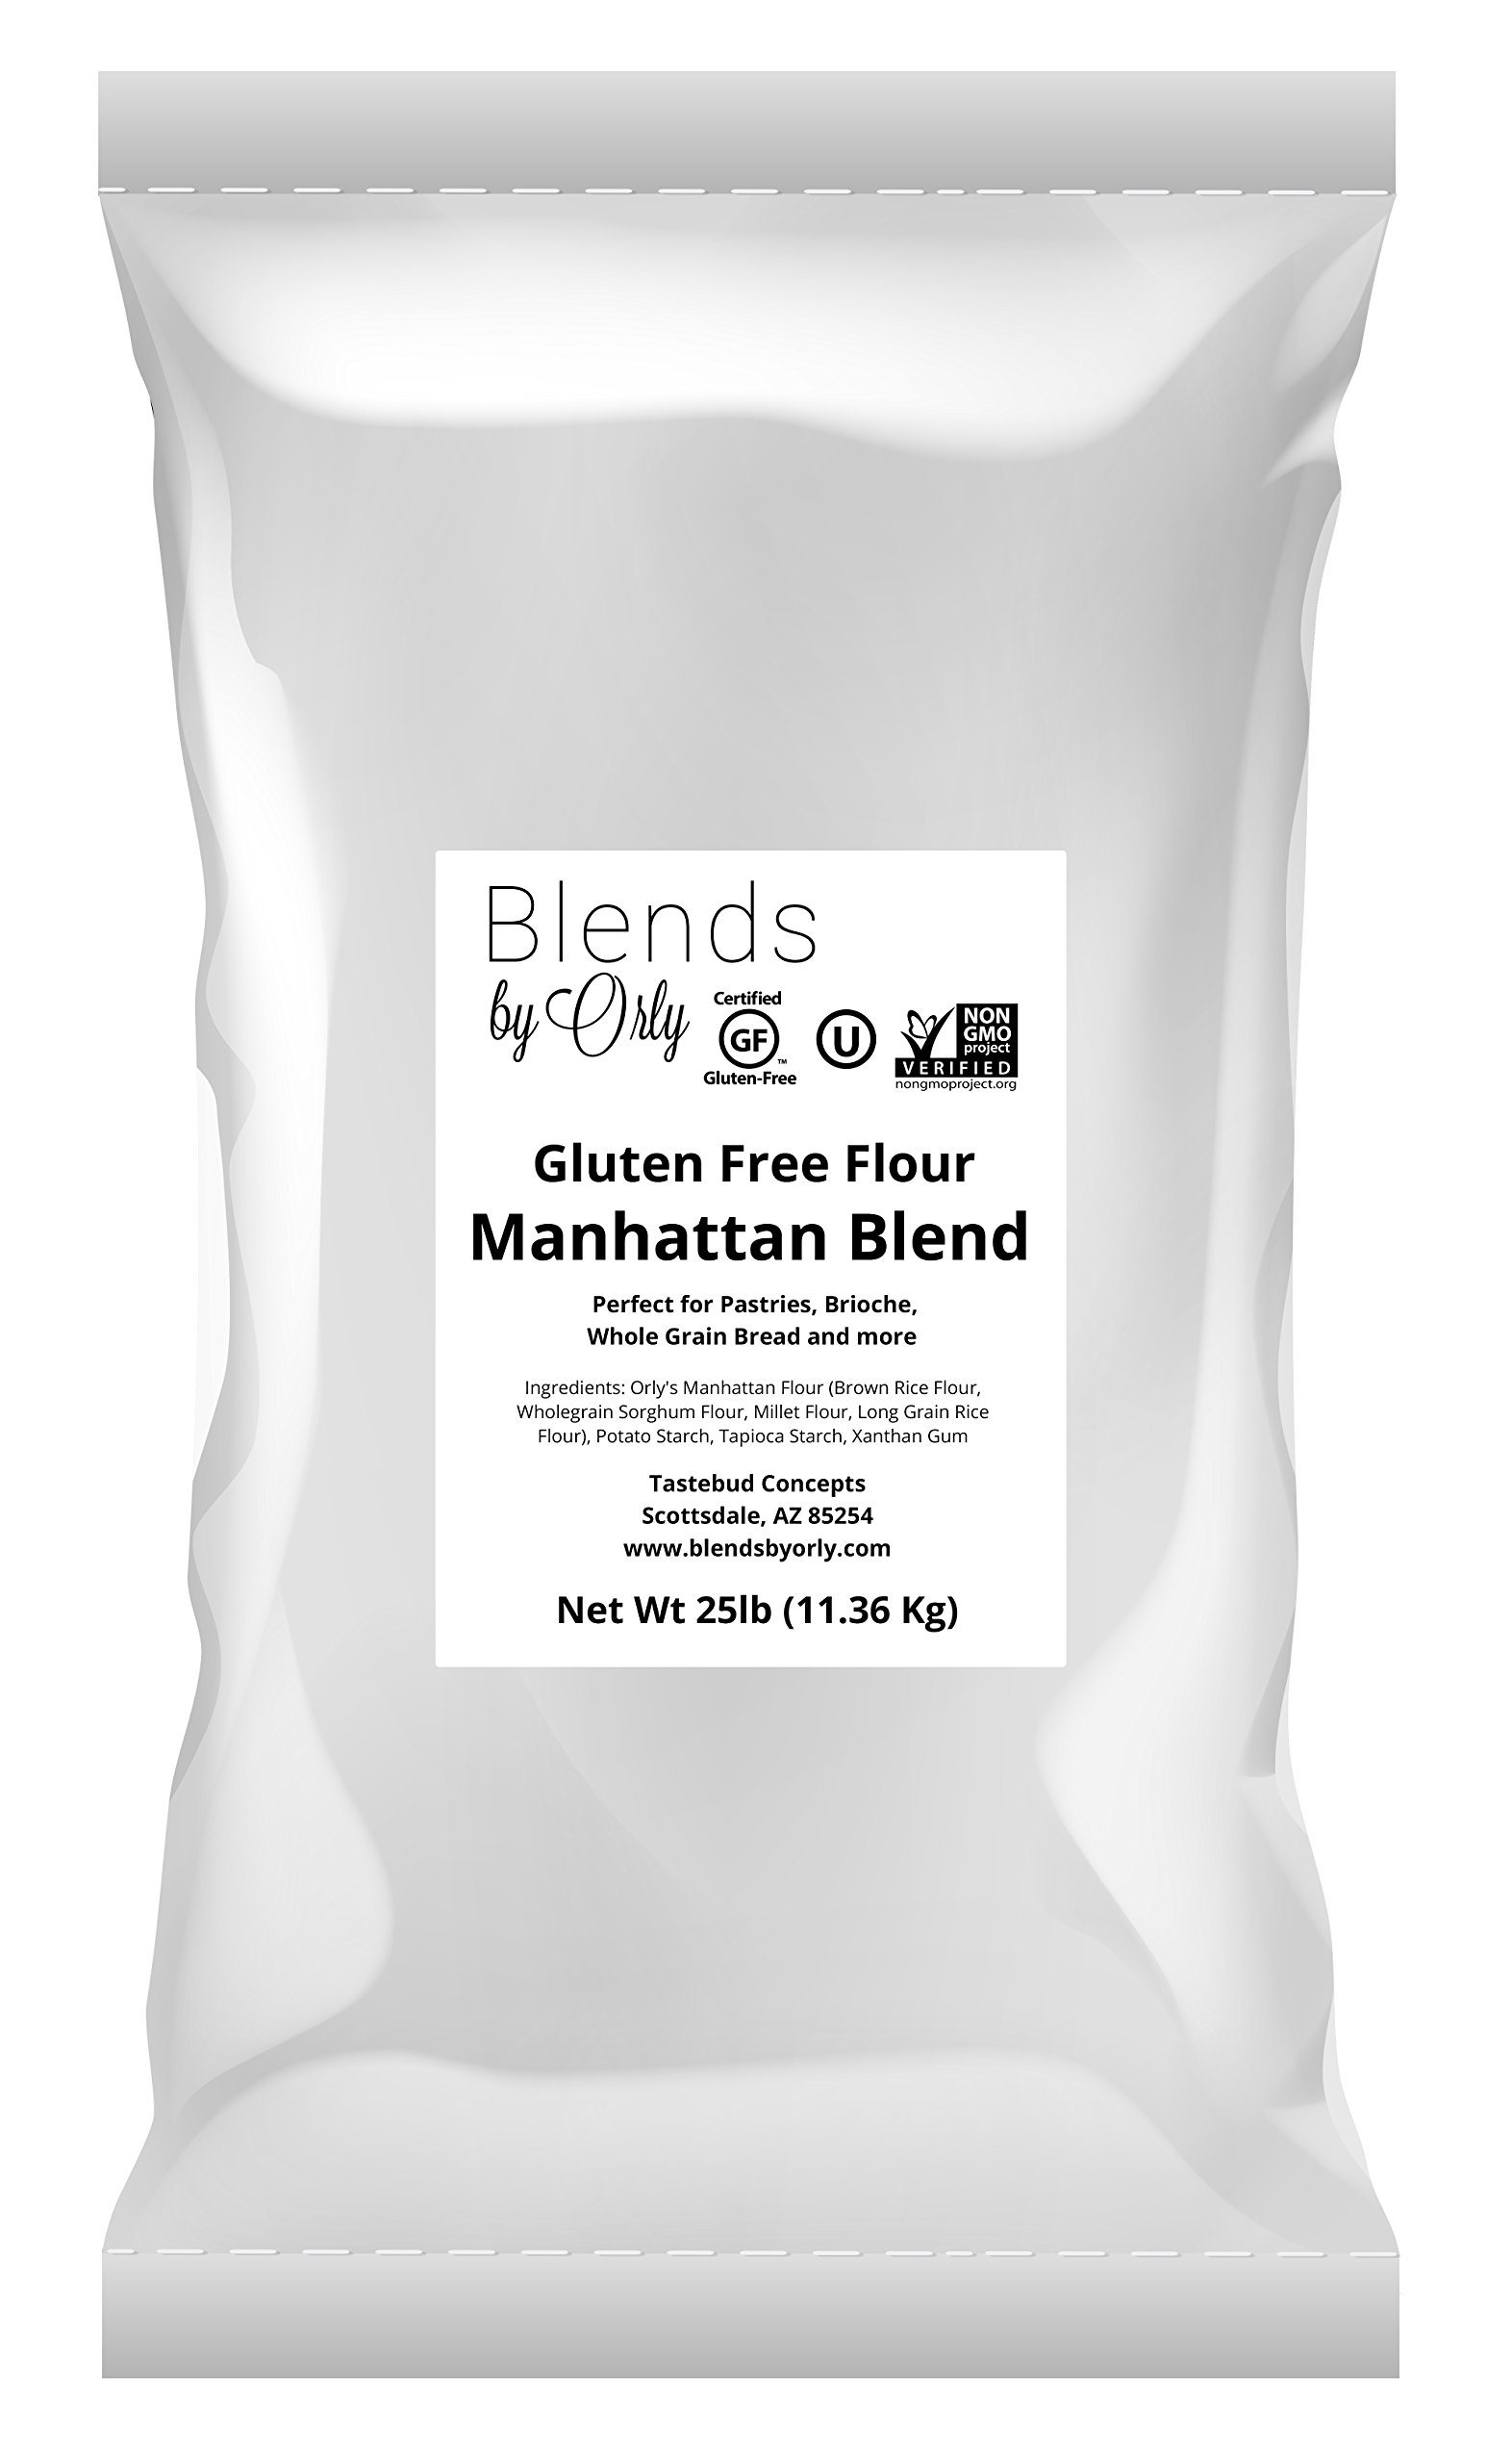 Premium Gluten Free Pastry Flour | Gluten Free Donut Flour - Baking Flour for Gluten Free Challah Bread, GF Brioche Bread, GF Cinnamon Roll & Gluten Free Bagels from Manhattan Blends by Orly 25 LB Bag by Blends By Orly